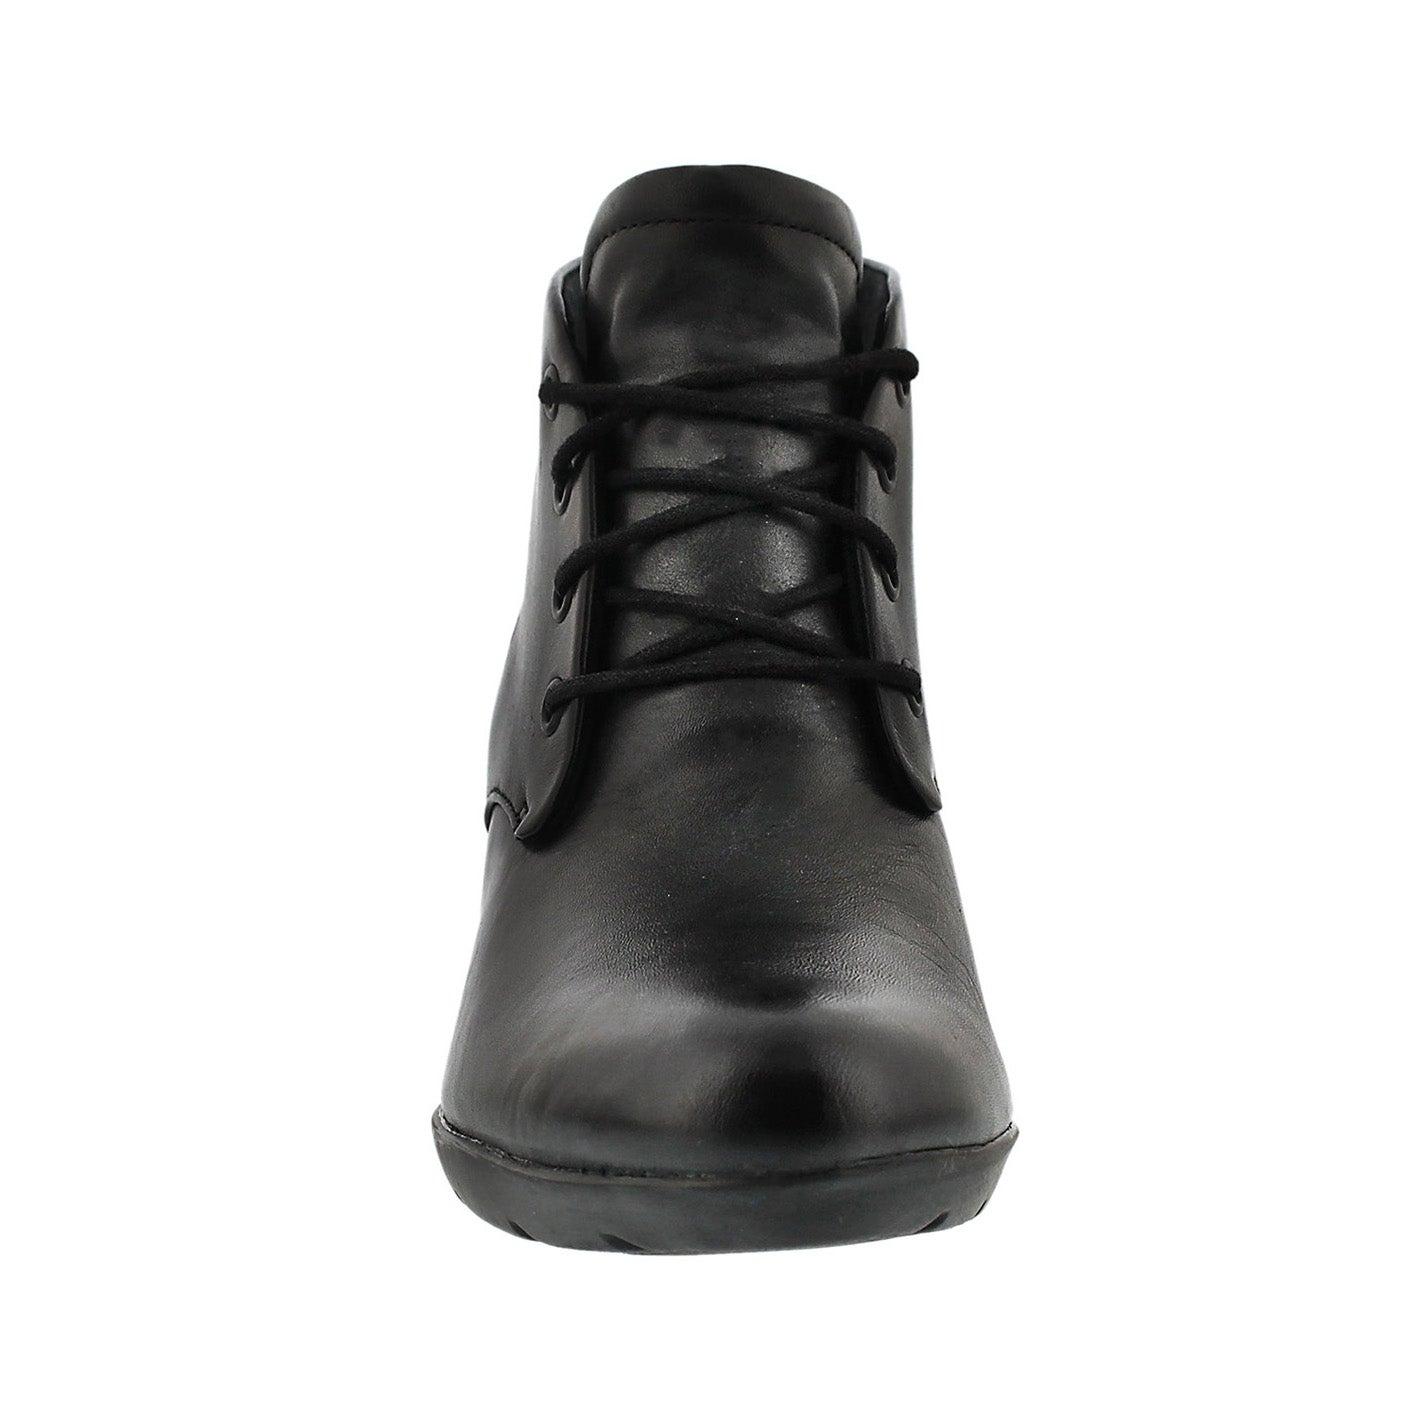 Lds Lucette Drama blk leather bootie